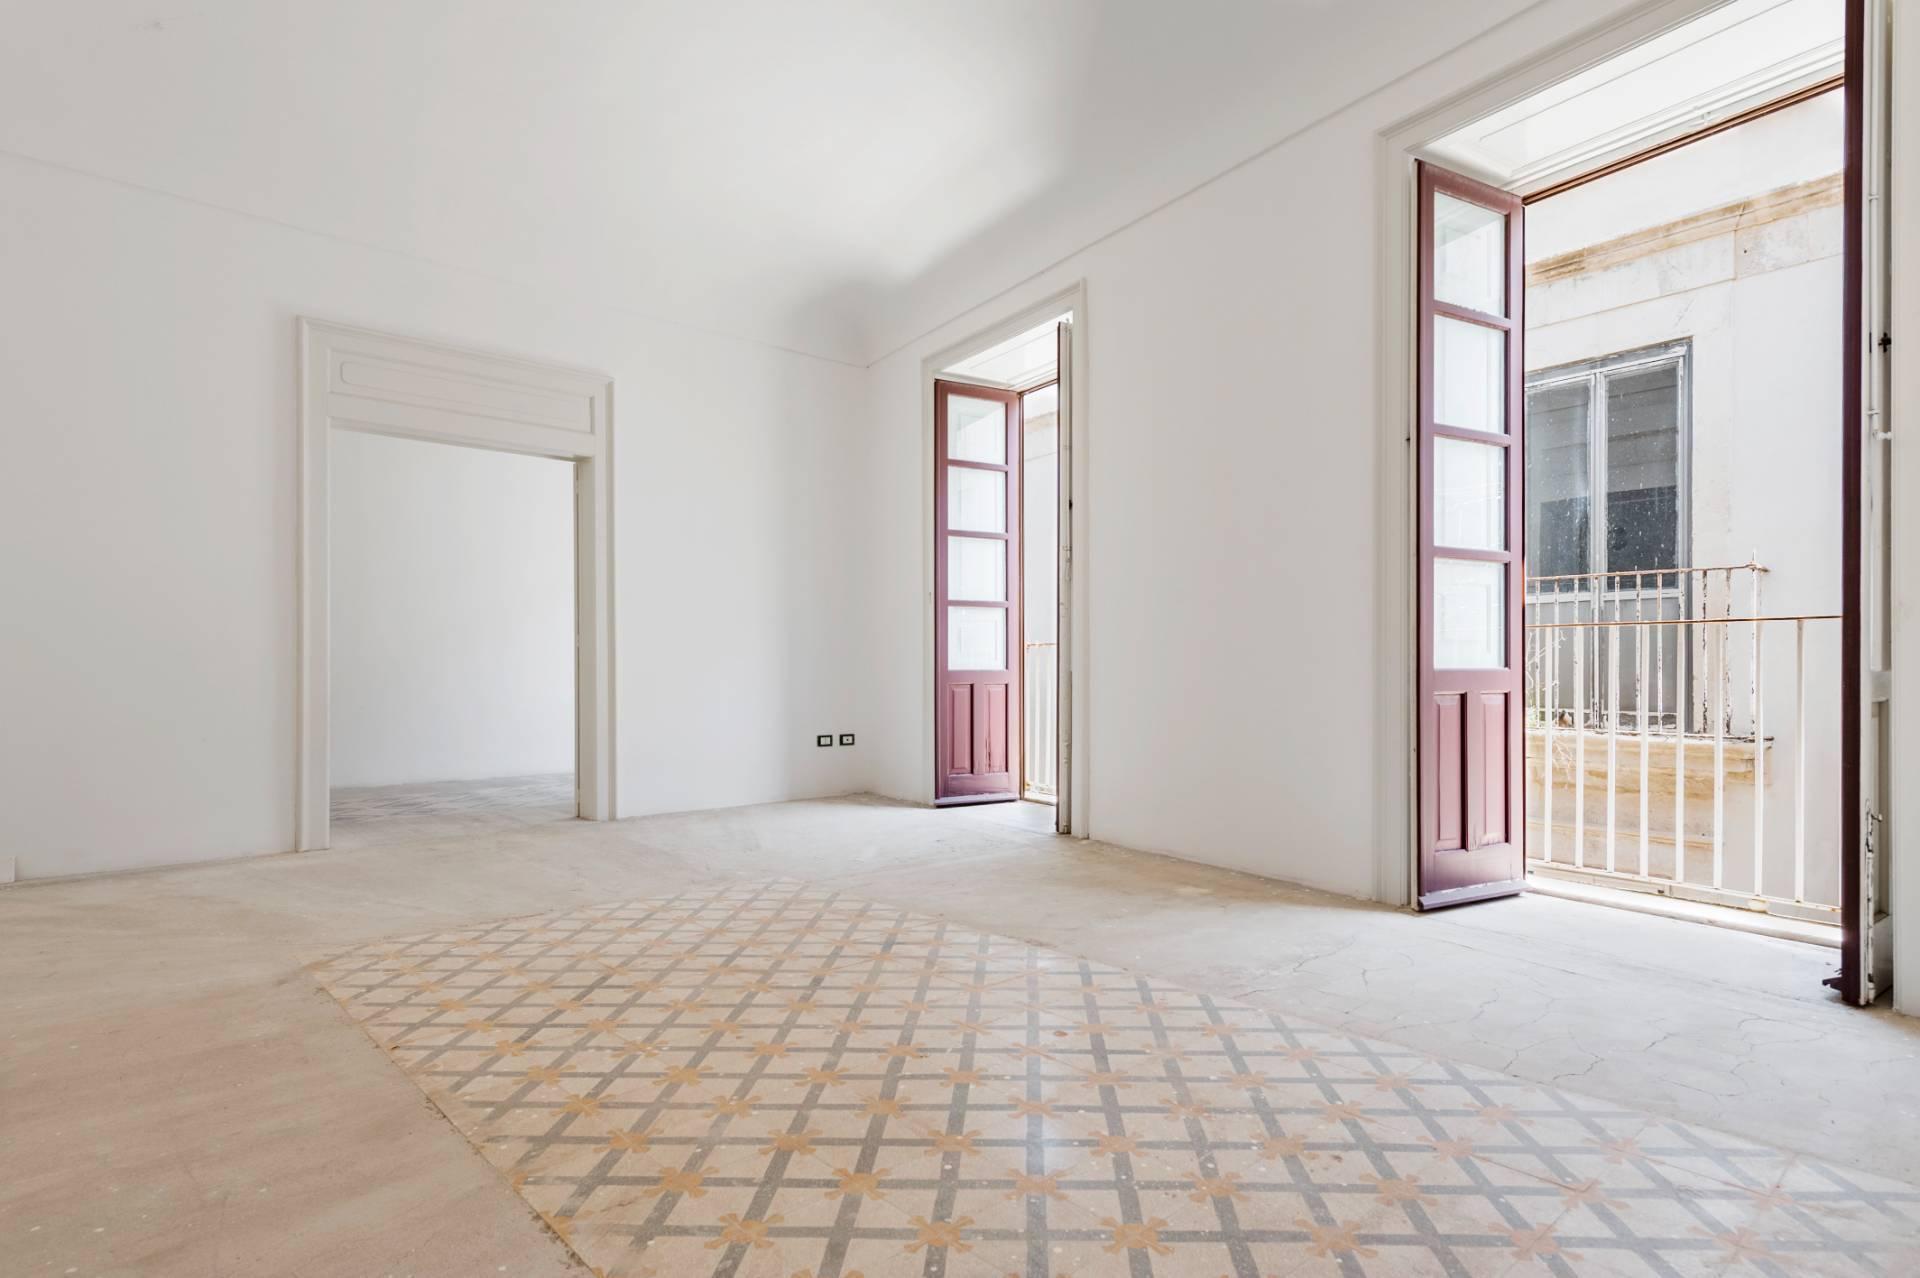 Palazzo in Vendita a Siracusa: 5 locali, 500 mq - Foto 7